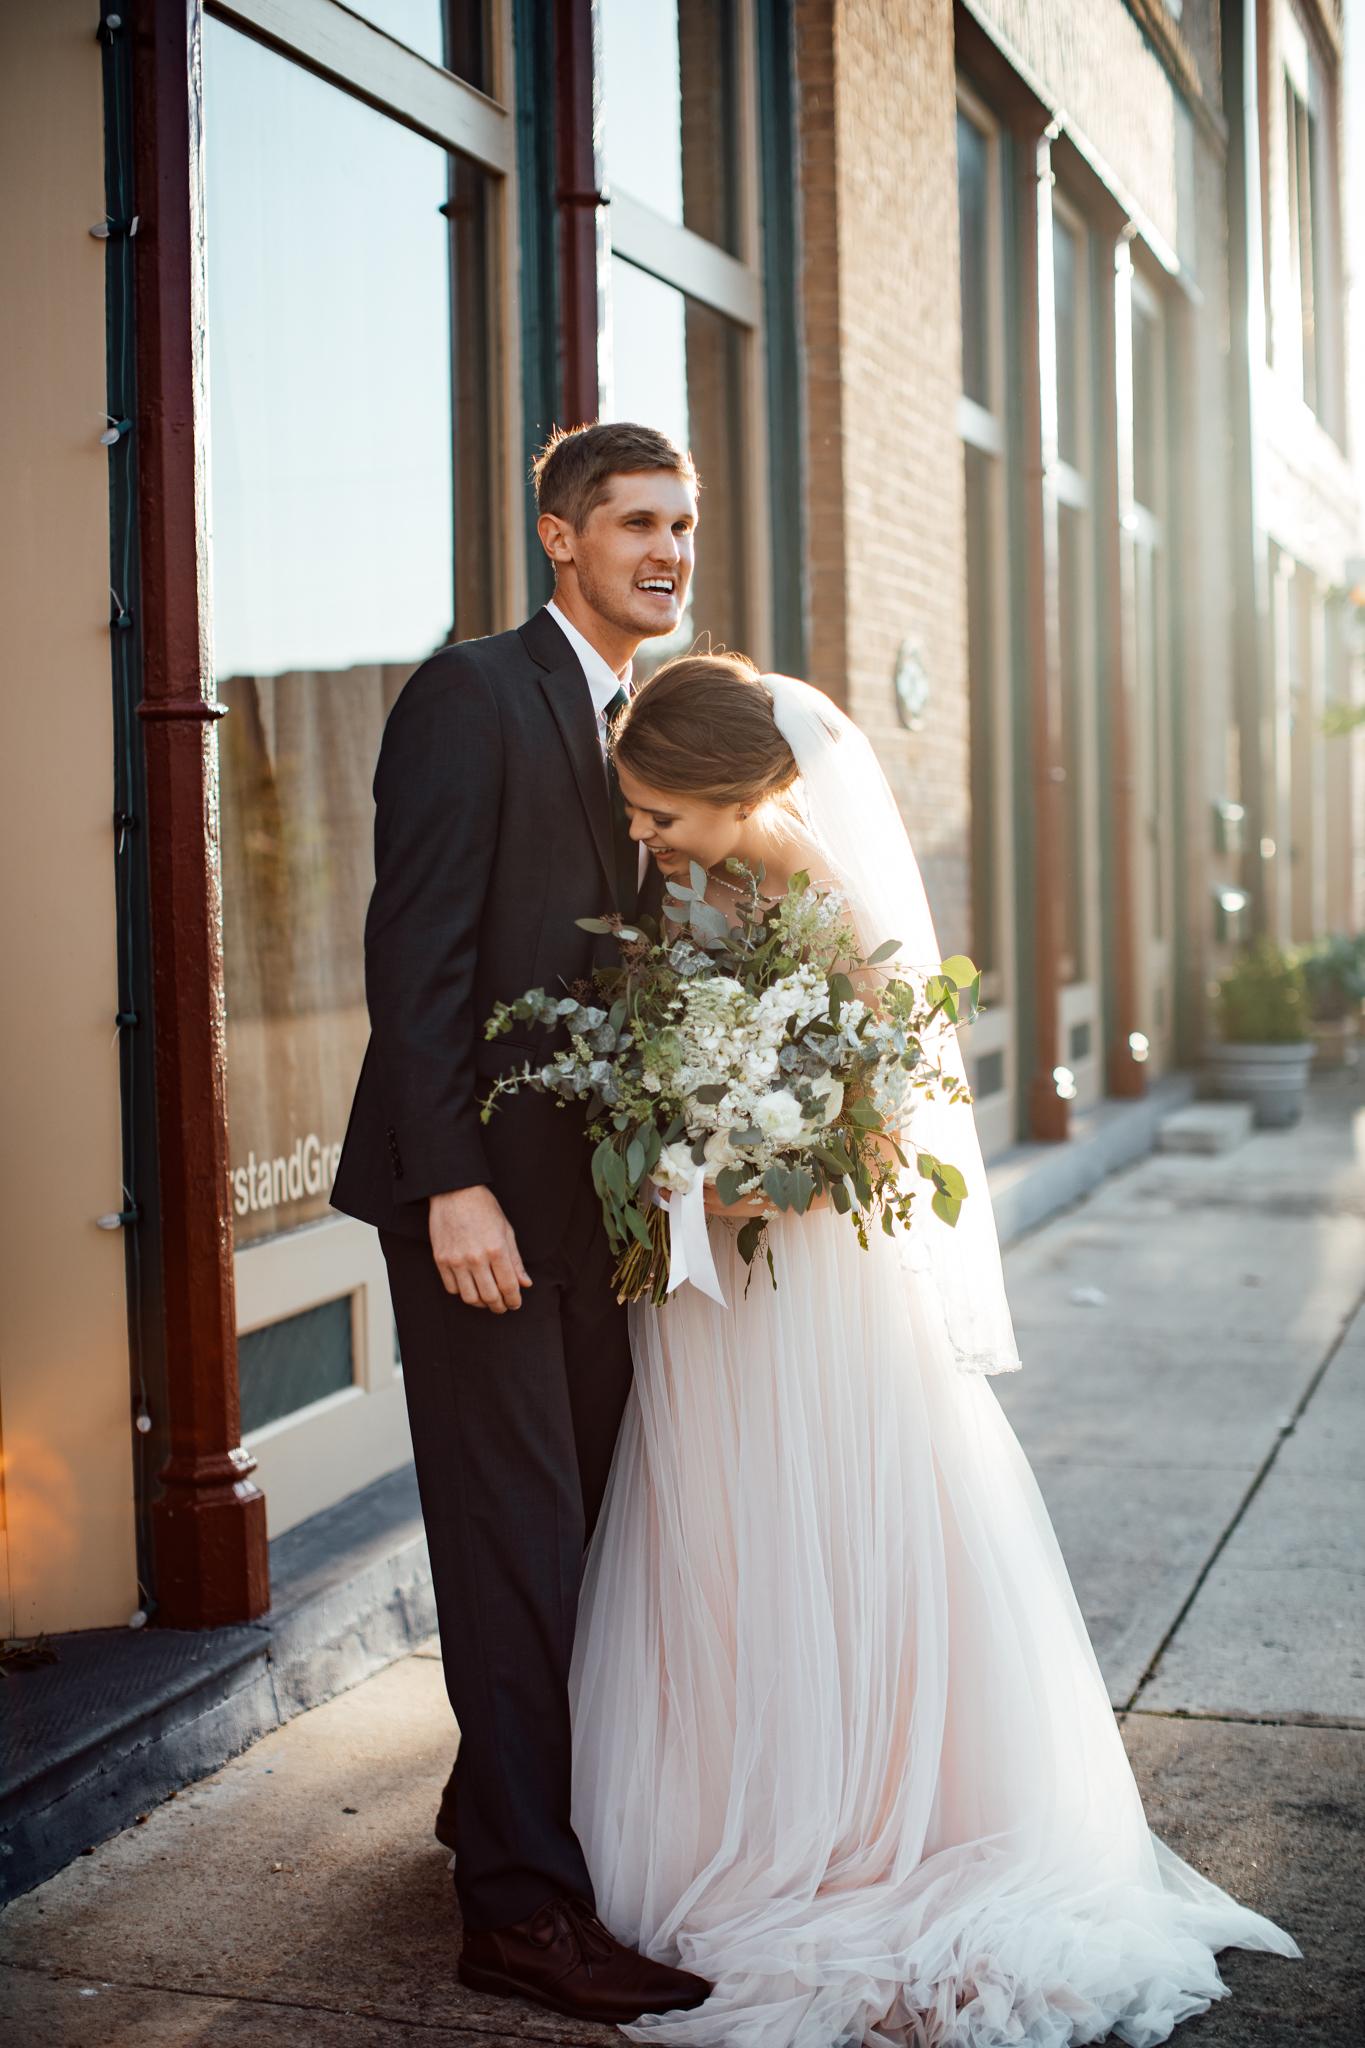 firstandgreen-grenada-ms-wedding-venue-thewarmtharoundyou-wedding-photographers (3 of 12).jpg